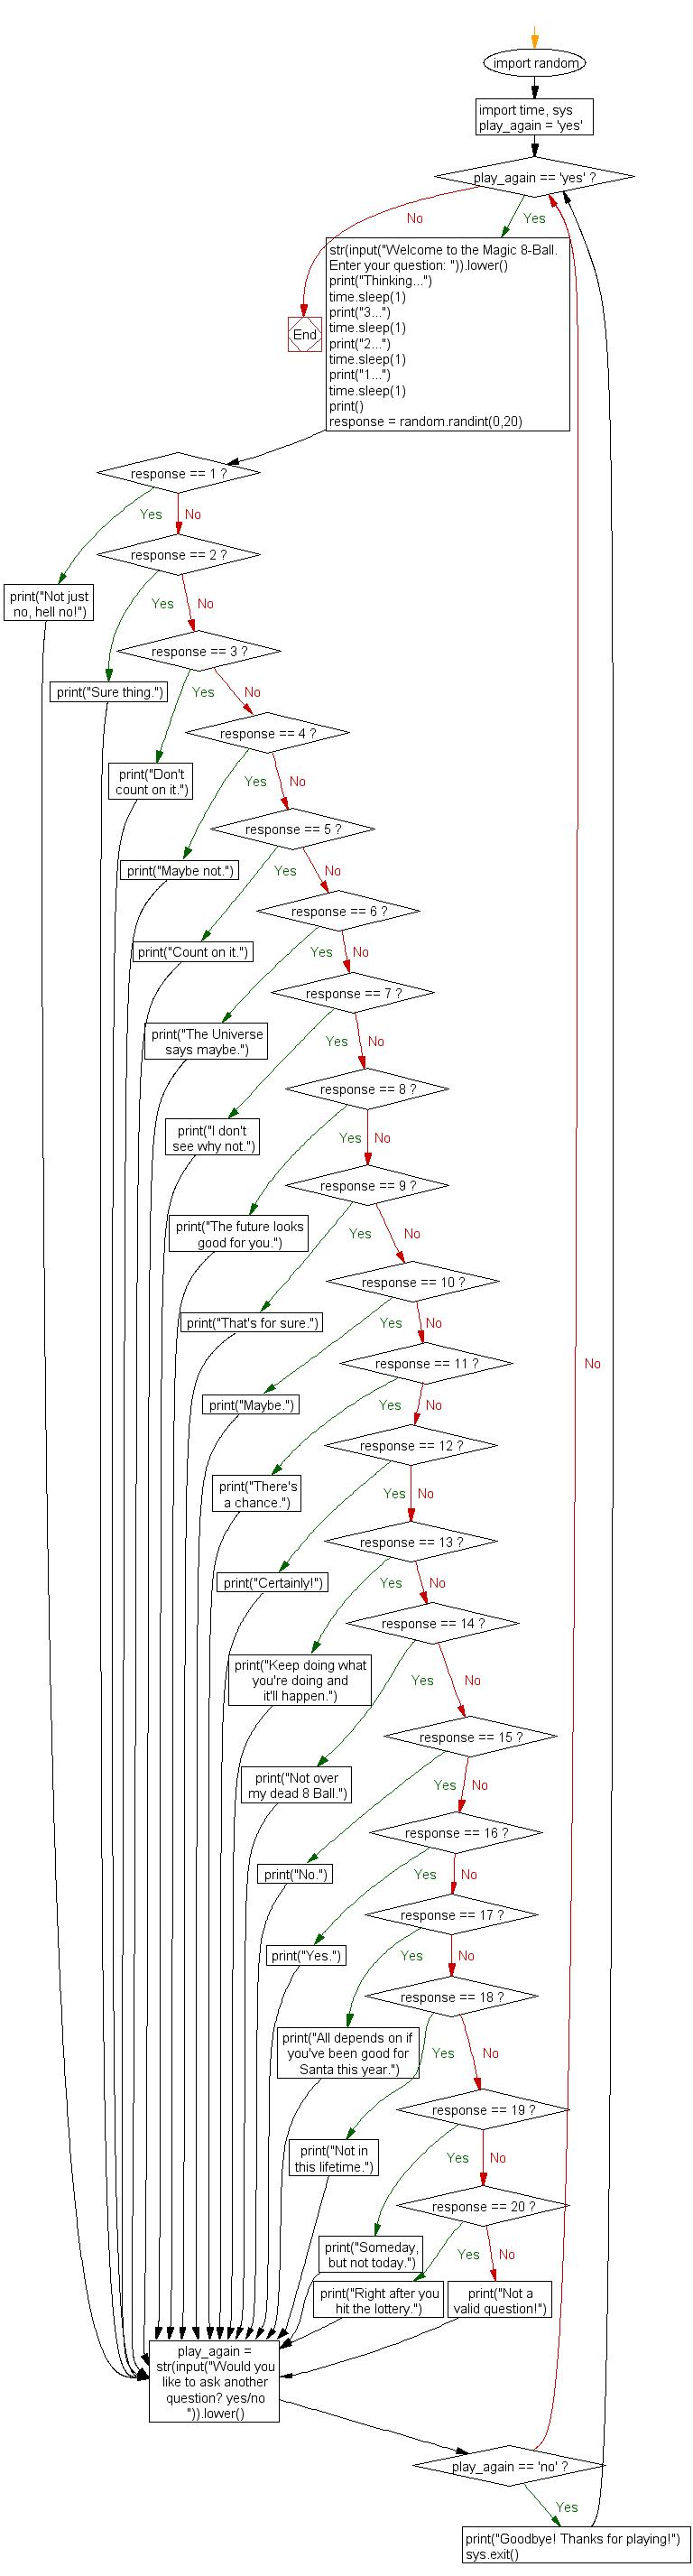 Python Flowchart: Magic 8 Ball-4